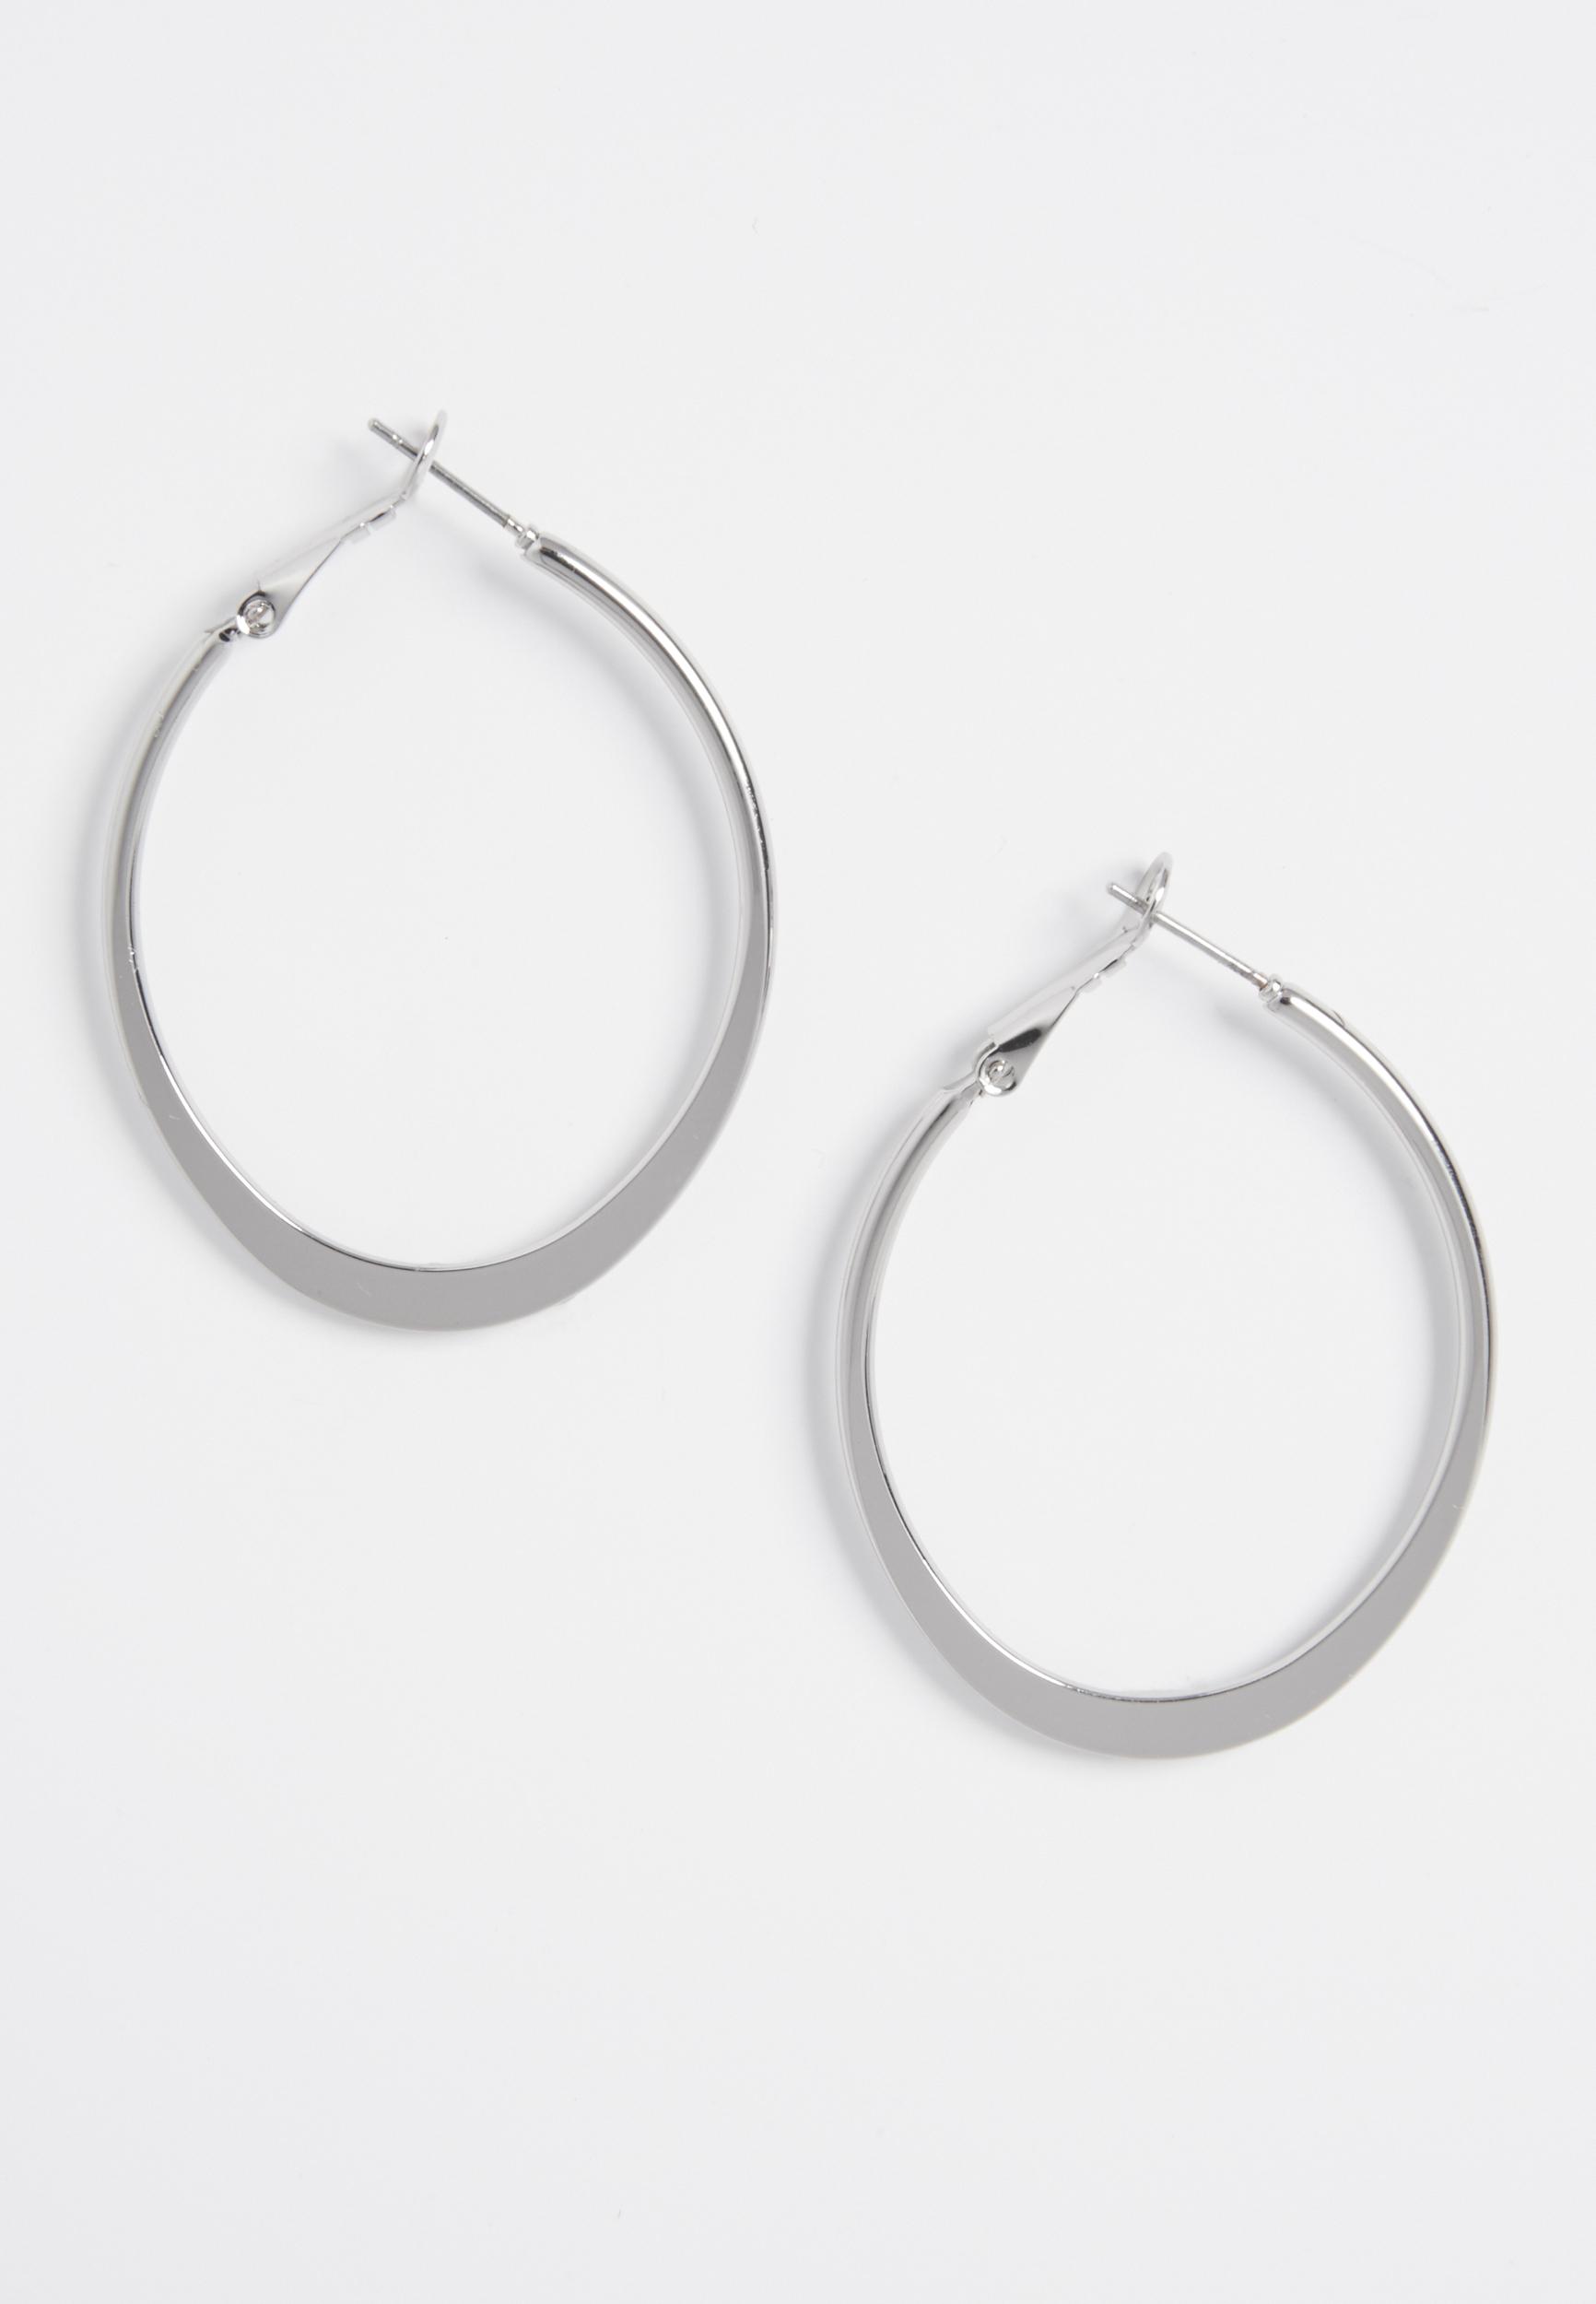 Maurices Oblong Shaped Hoop Earrings 5oO8tl6